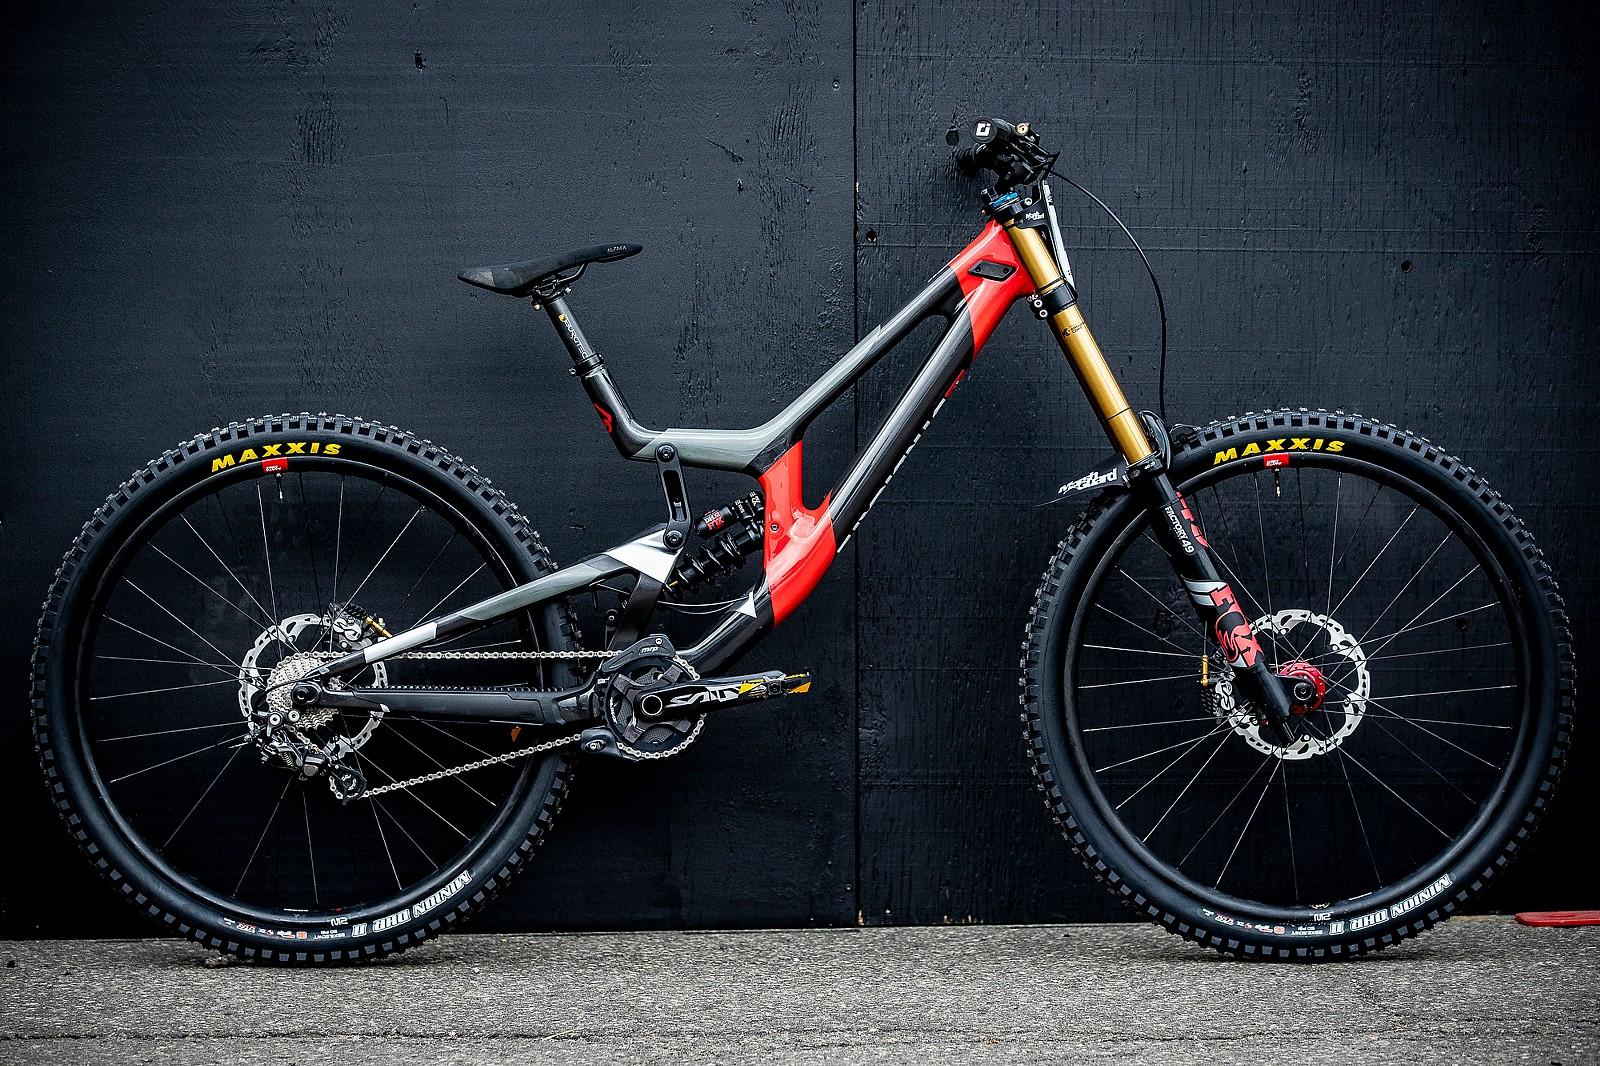 Luca Shaw's Santa Cruz V10 for World Champs - Santa Cruz Syndicate 2019 World Championships Race Bikes - Mountain Biking Pictures - Vital MTB